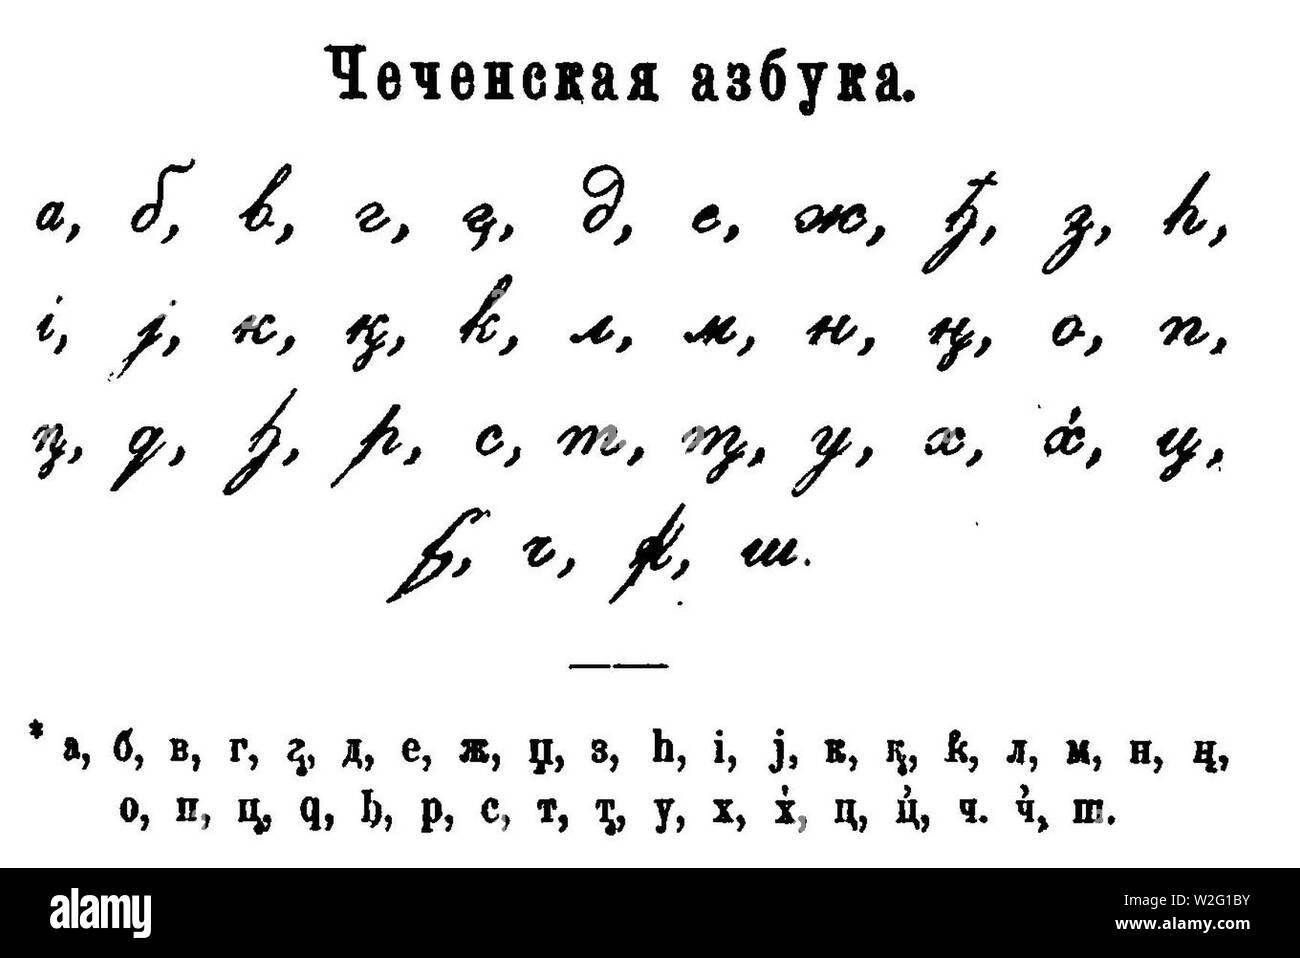 Chechen alphabet by Uslar. - Stock Image